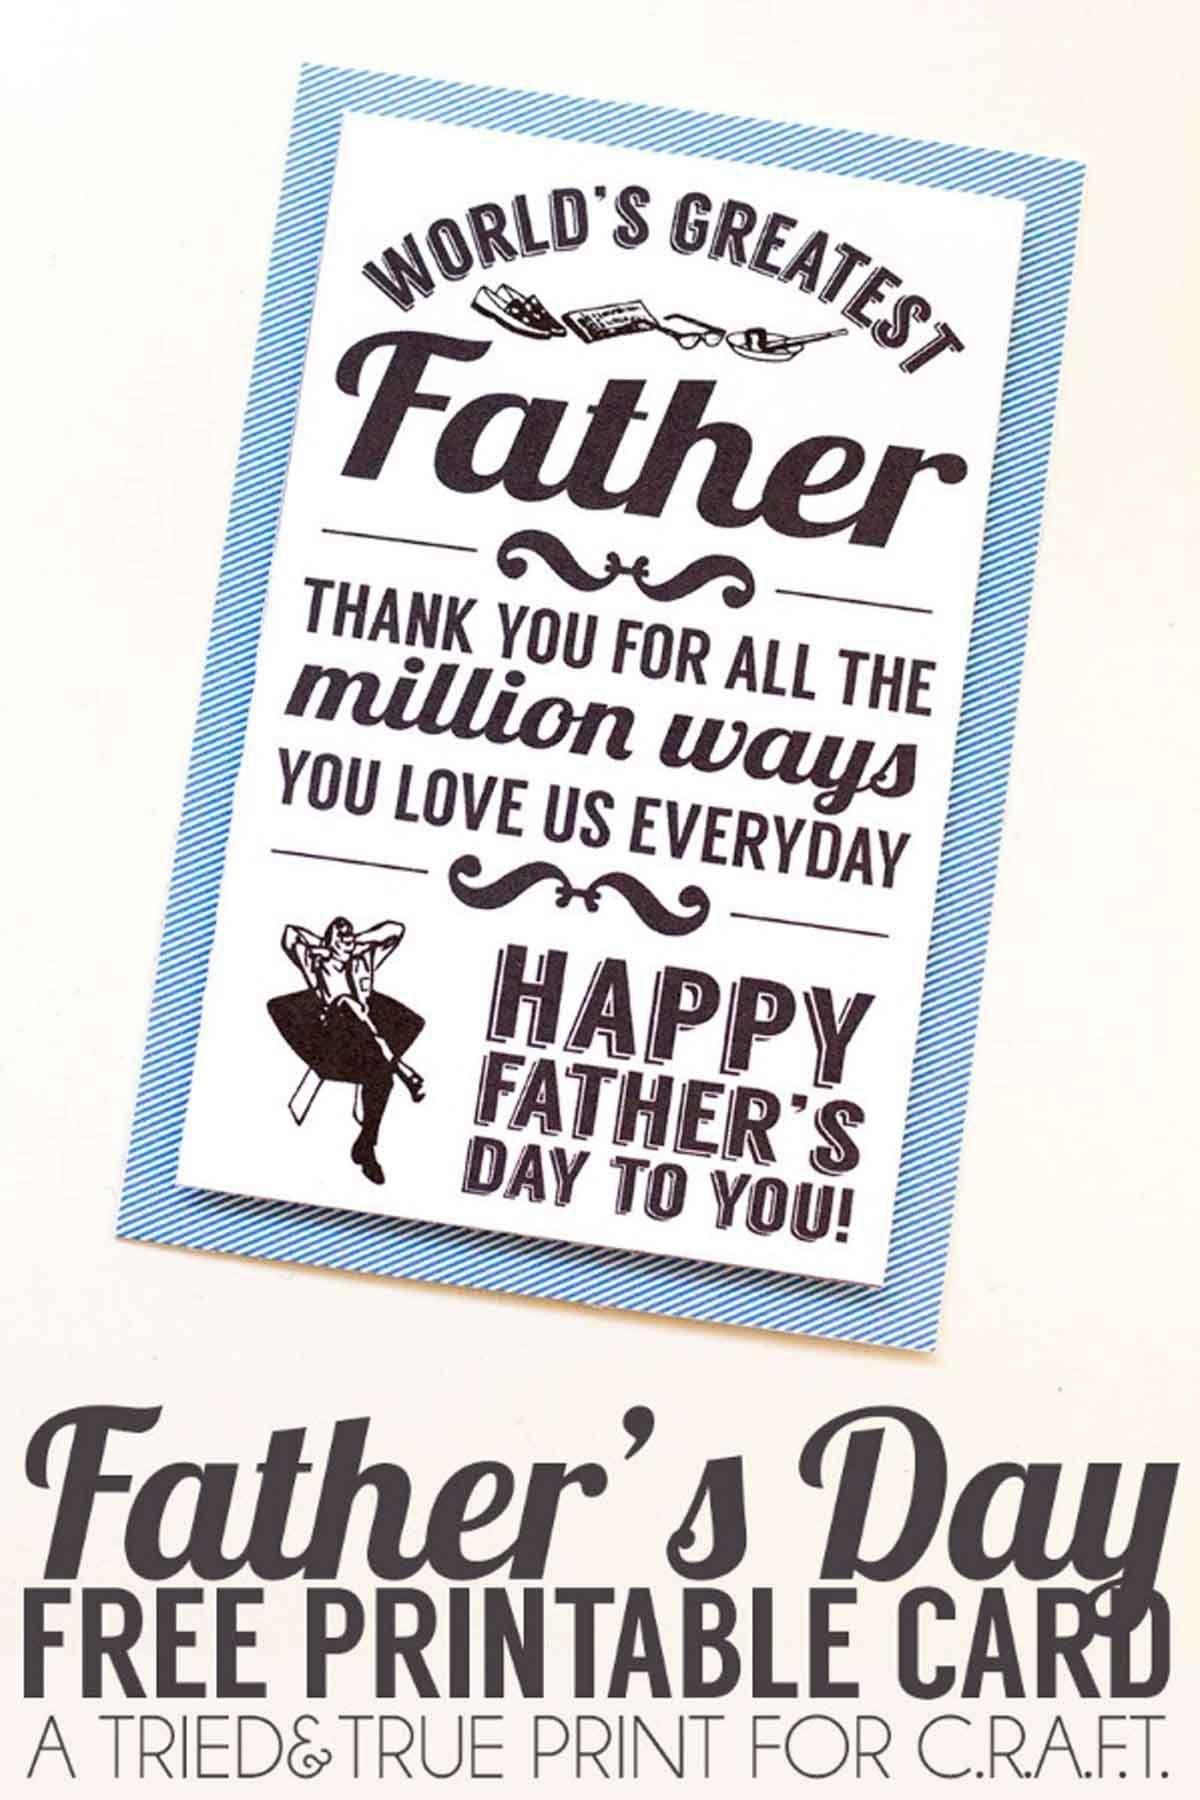 25 Printable Father's Day Cards - Free Printable Cards For Father's Day - Father's Day Card Printable Free